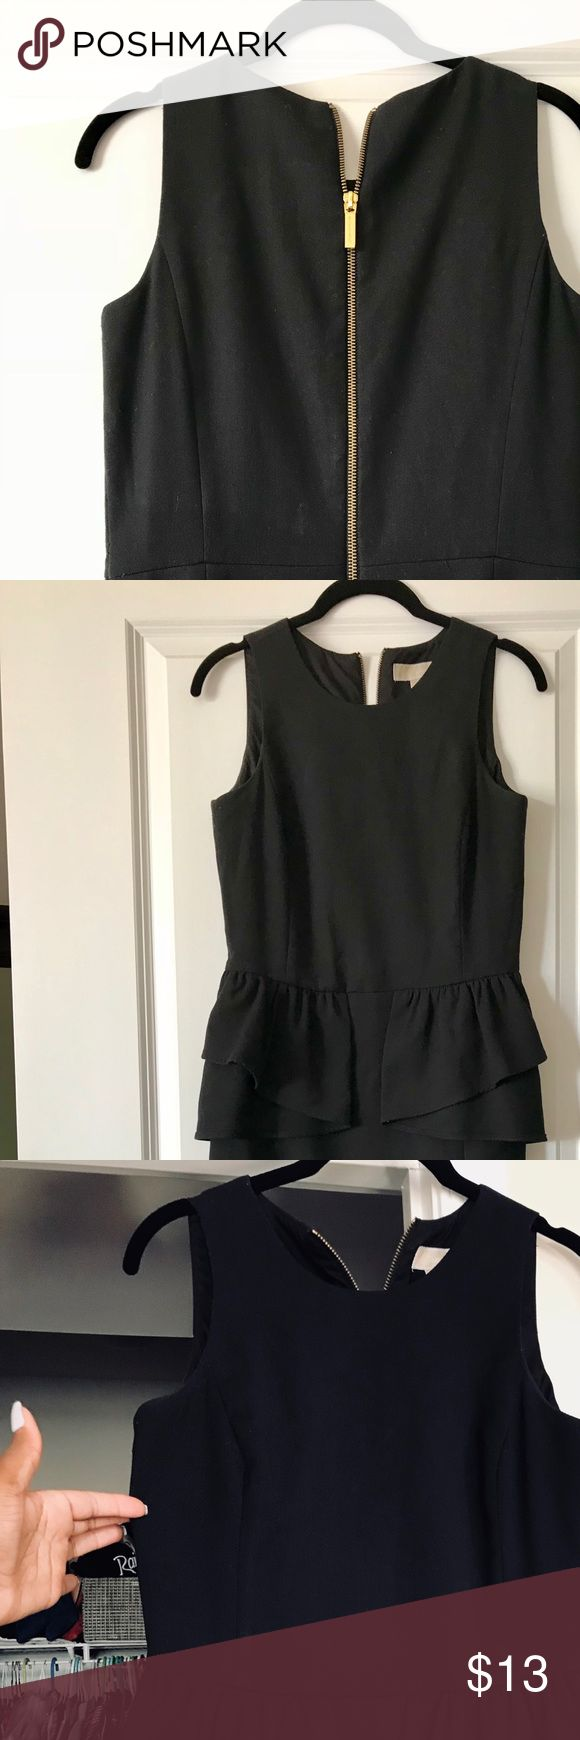 Michael Kors Black Peplum Dress. Classic little black (Peplum) dress with gold back zipper. An absolute staple for any wardrobe! MICHAEL Michael Kors Dresses Midi